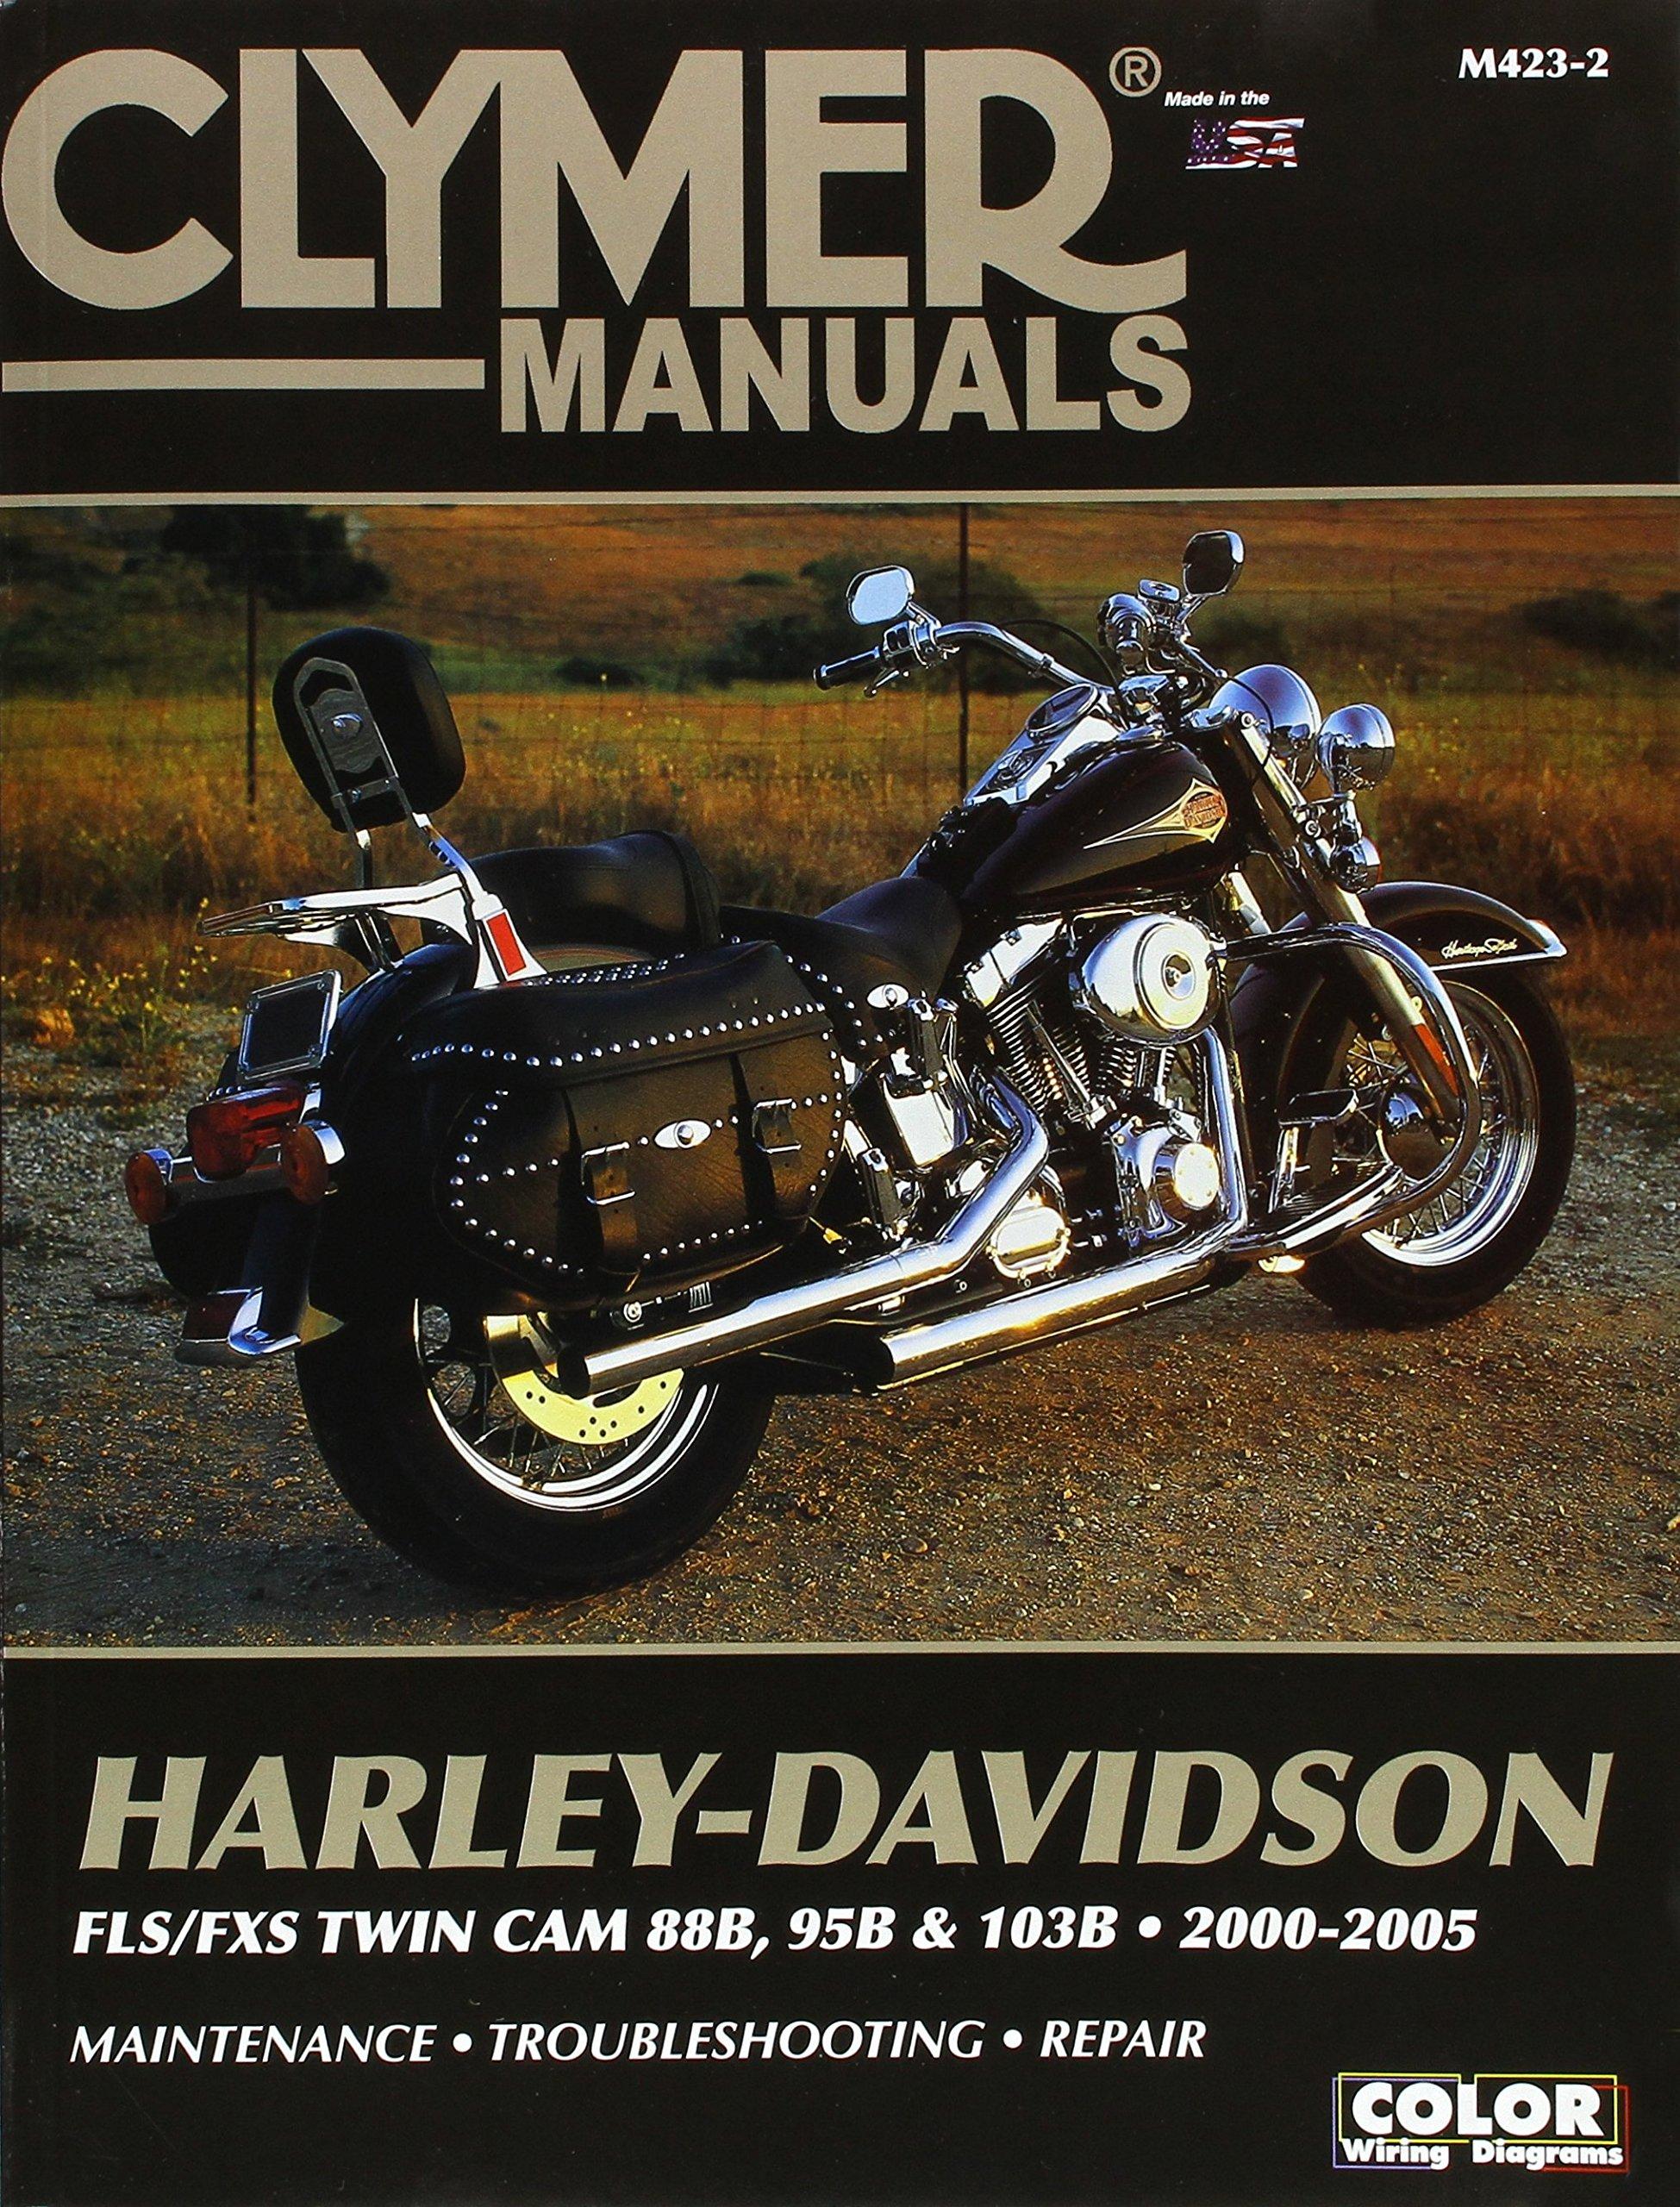 Clymer Harley Davidson Fls Fxs Twin Cam 88b 95b 103b 2000 2005 Wiring Diagram Penton Staff 9780892879625 Books